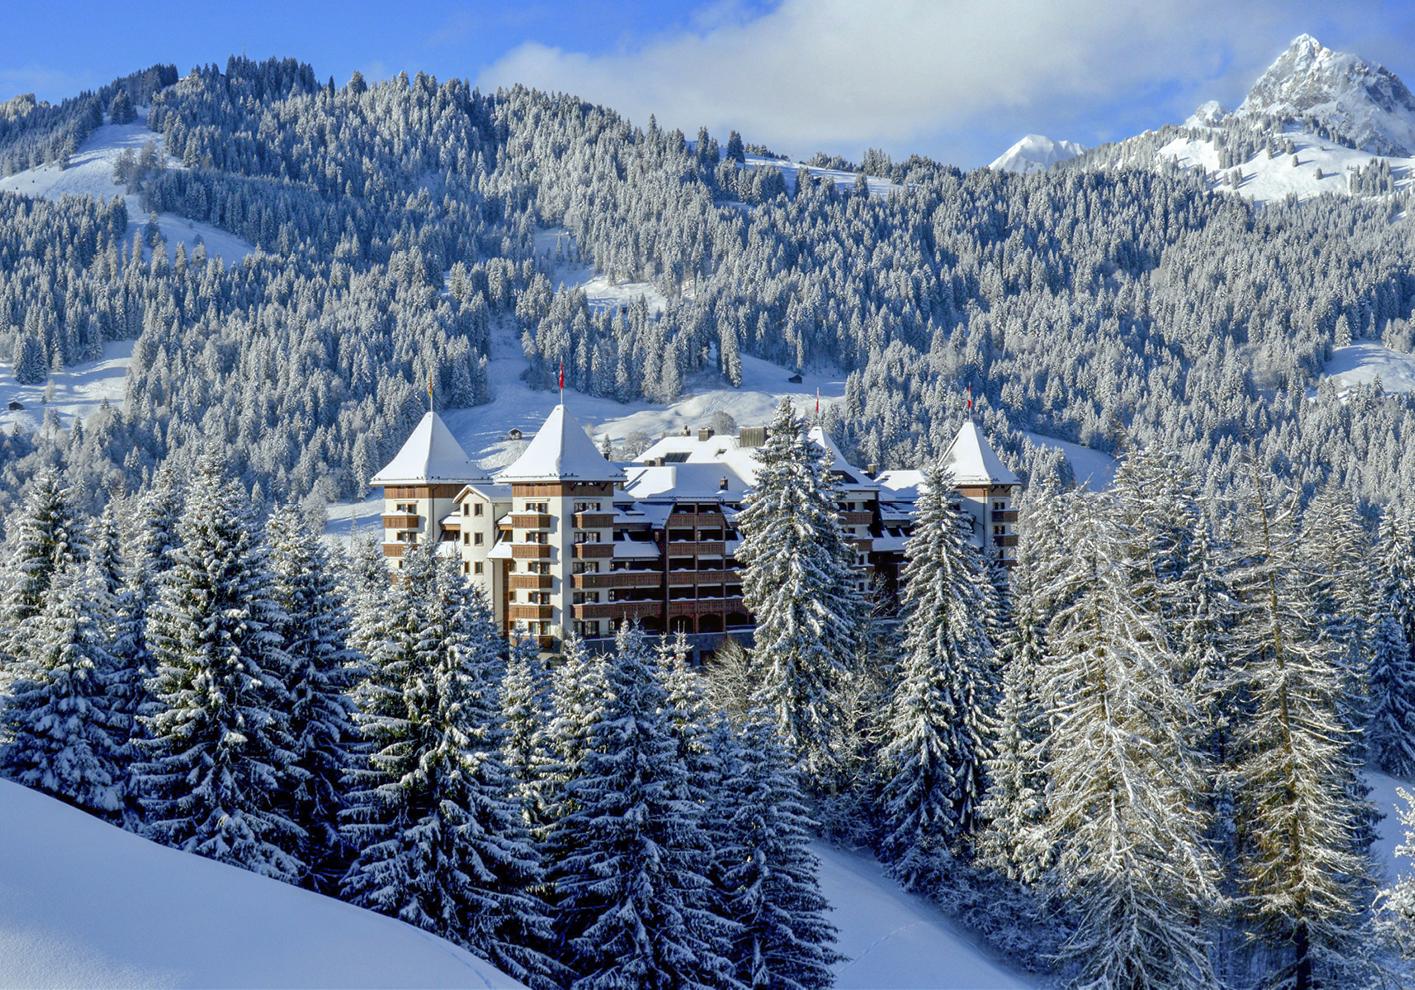 The Alpine Gstaad hotel